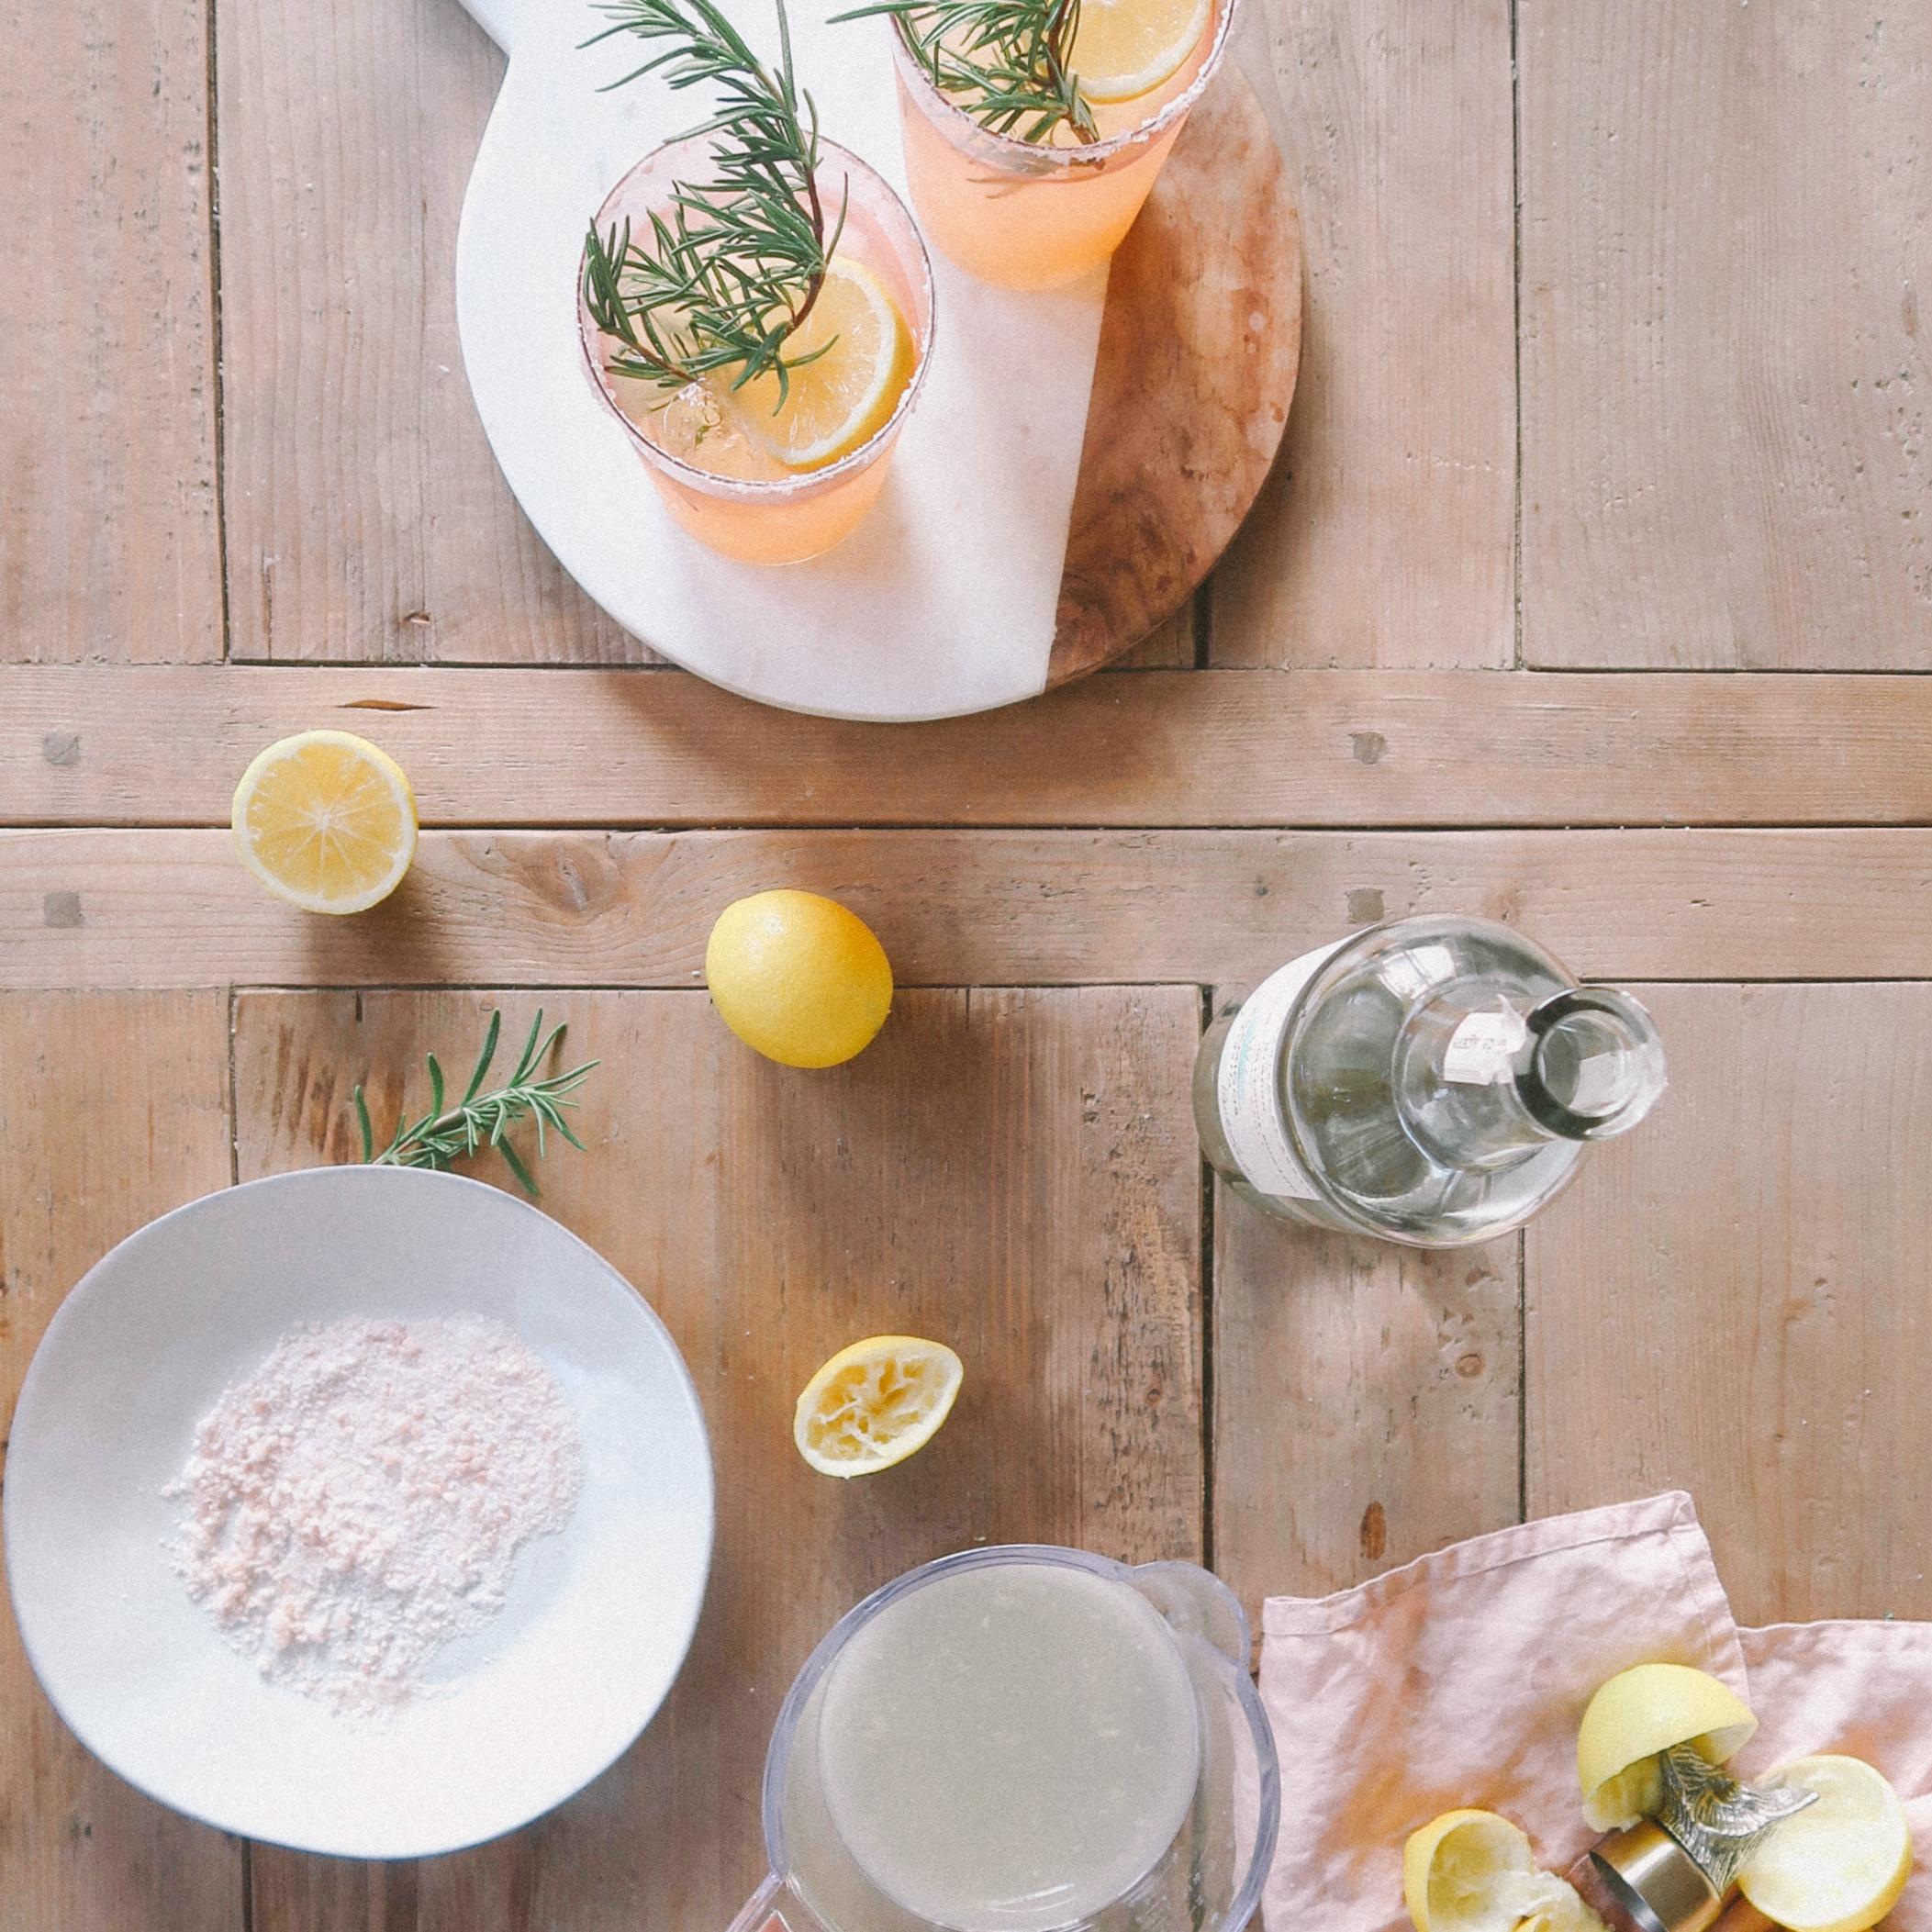 Meyer Lemon and Rosemary Margarita Recipe